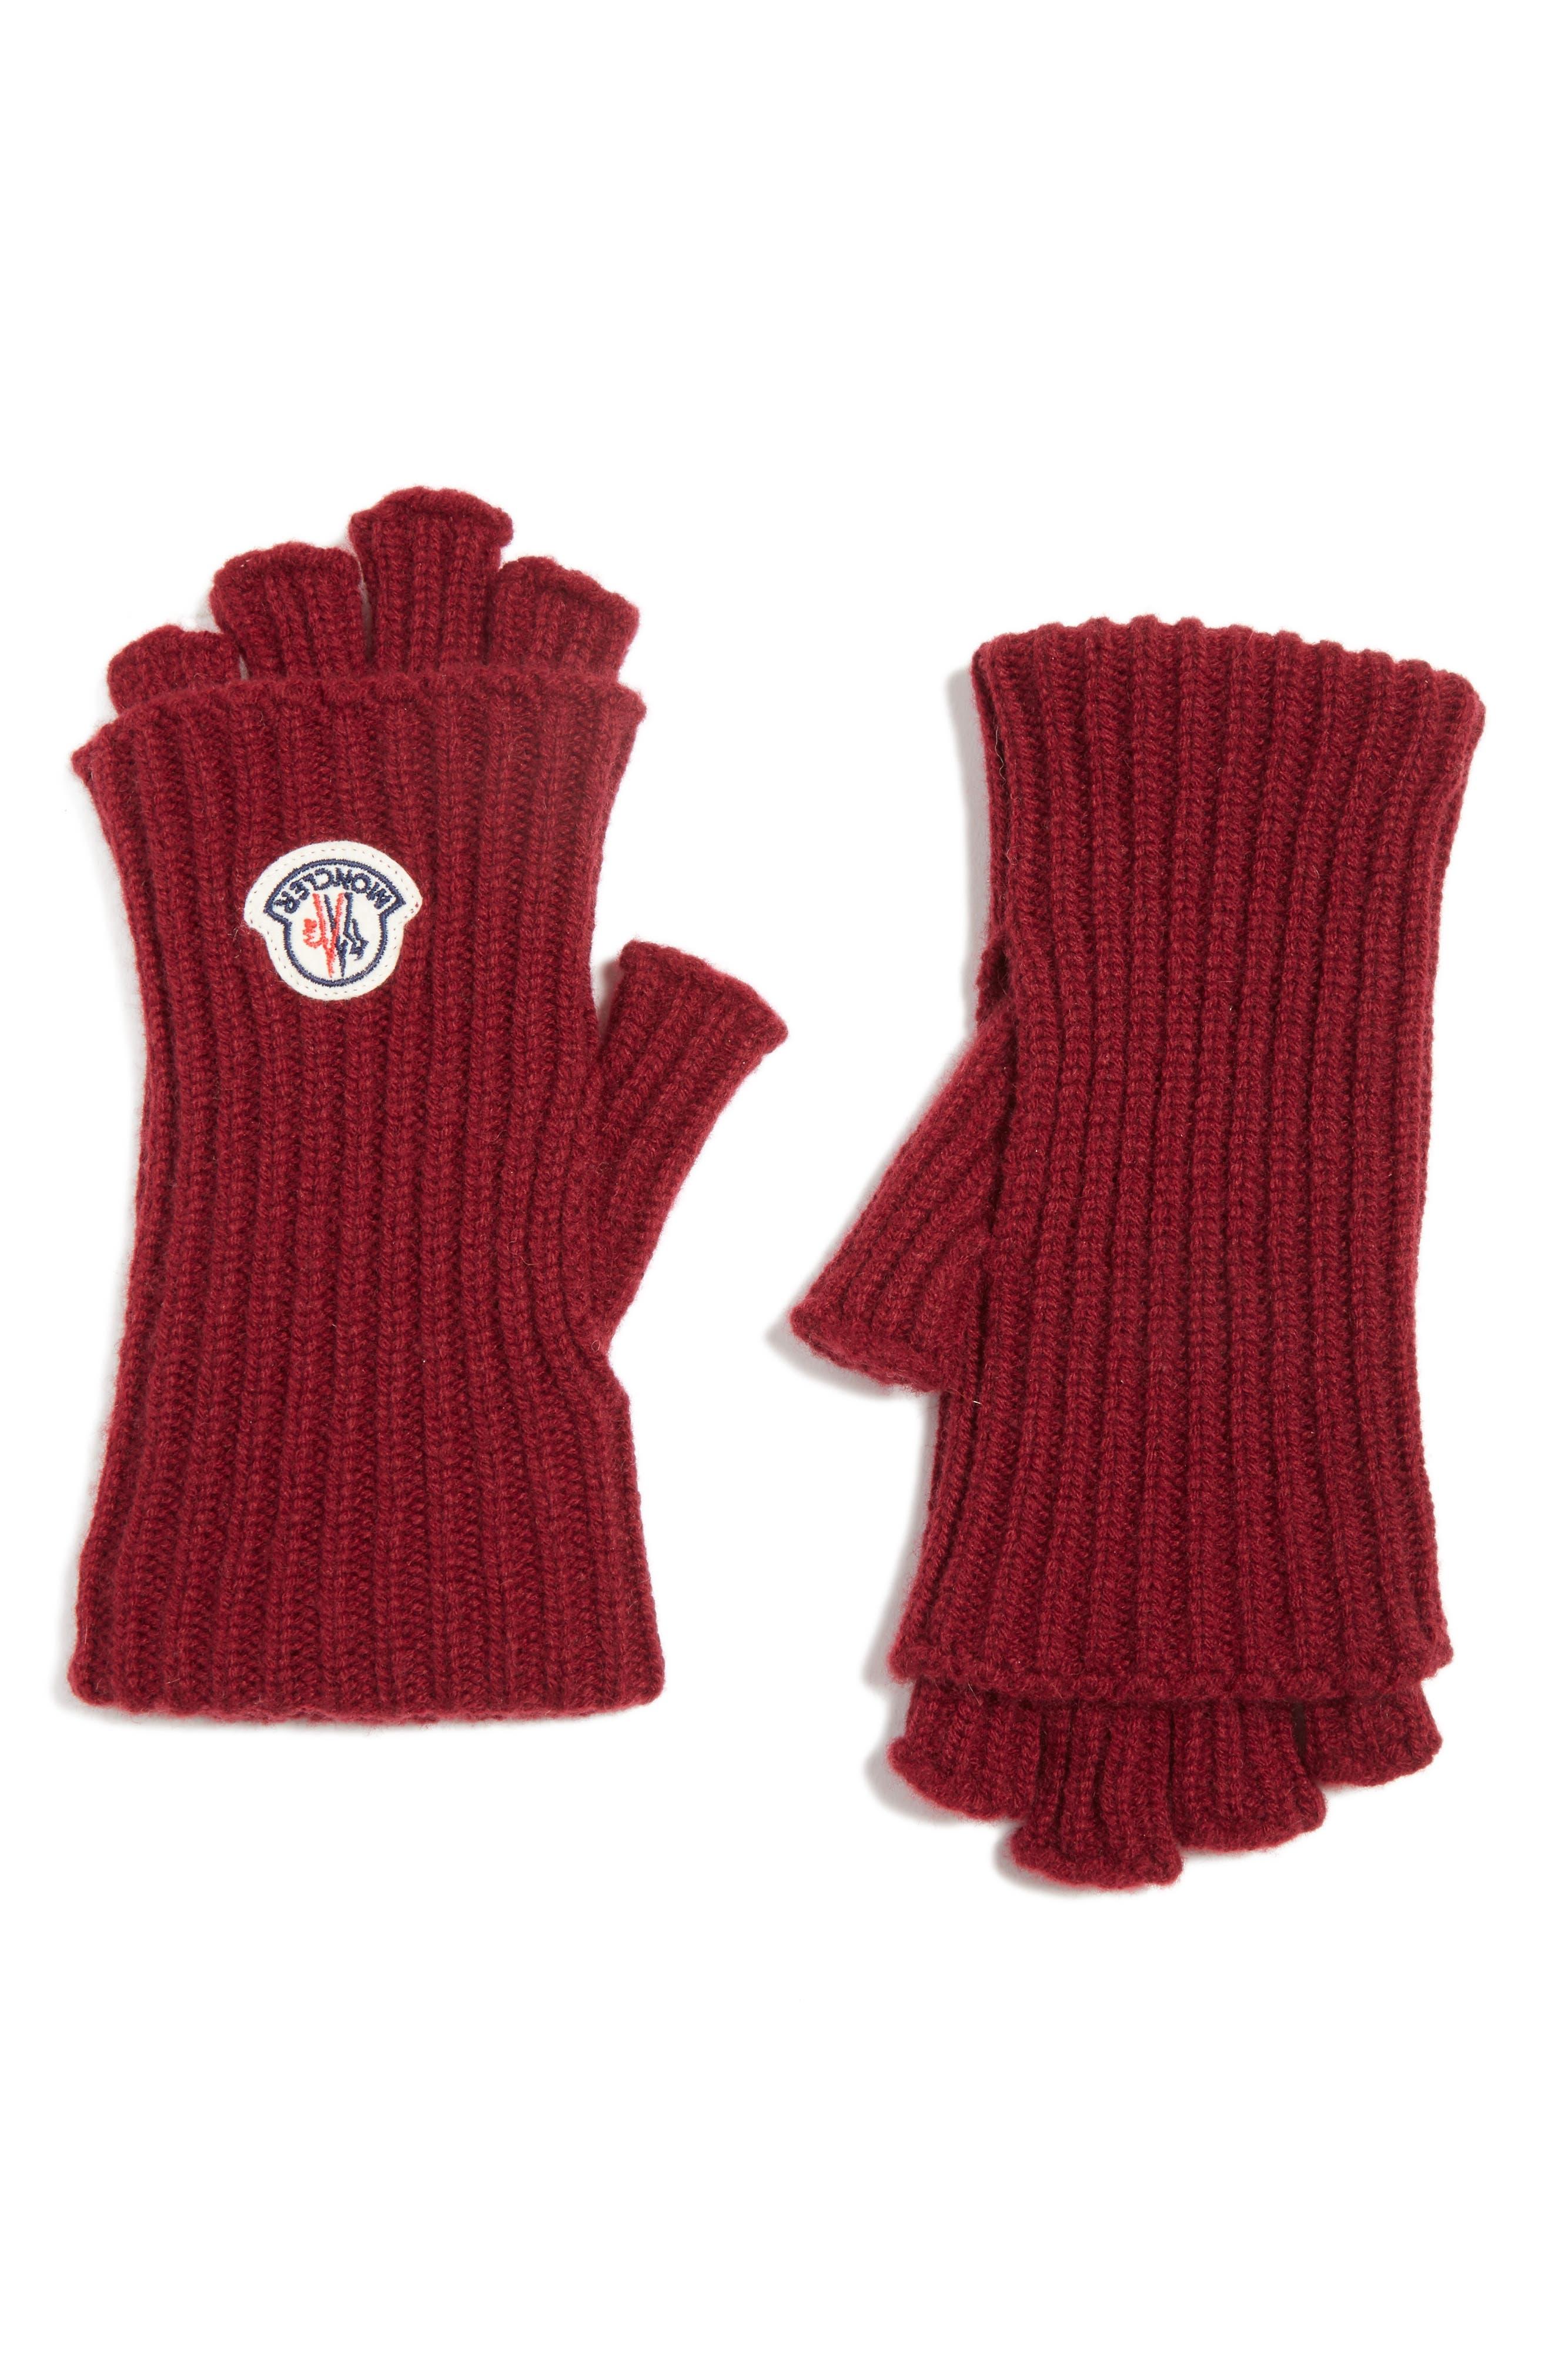 Guanti Wool & Cashmere Long Fingerless Gloves,                             Main thumbnail 1, color,                             BURGUNDY